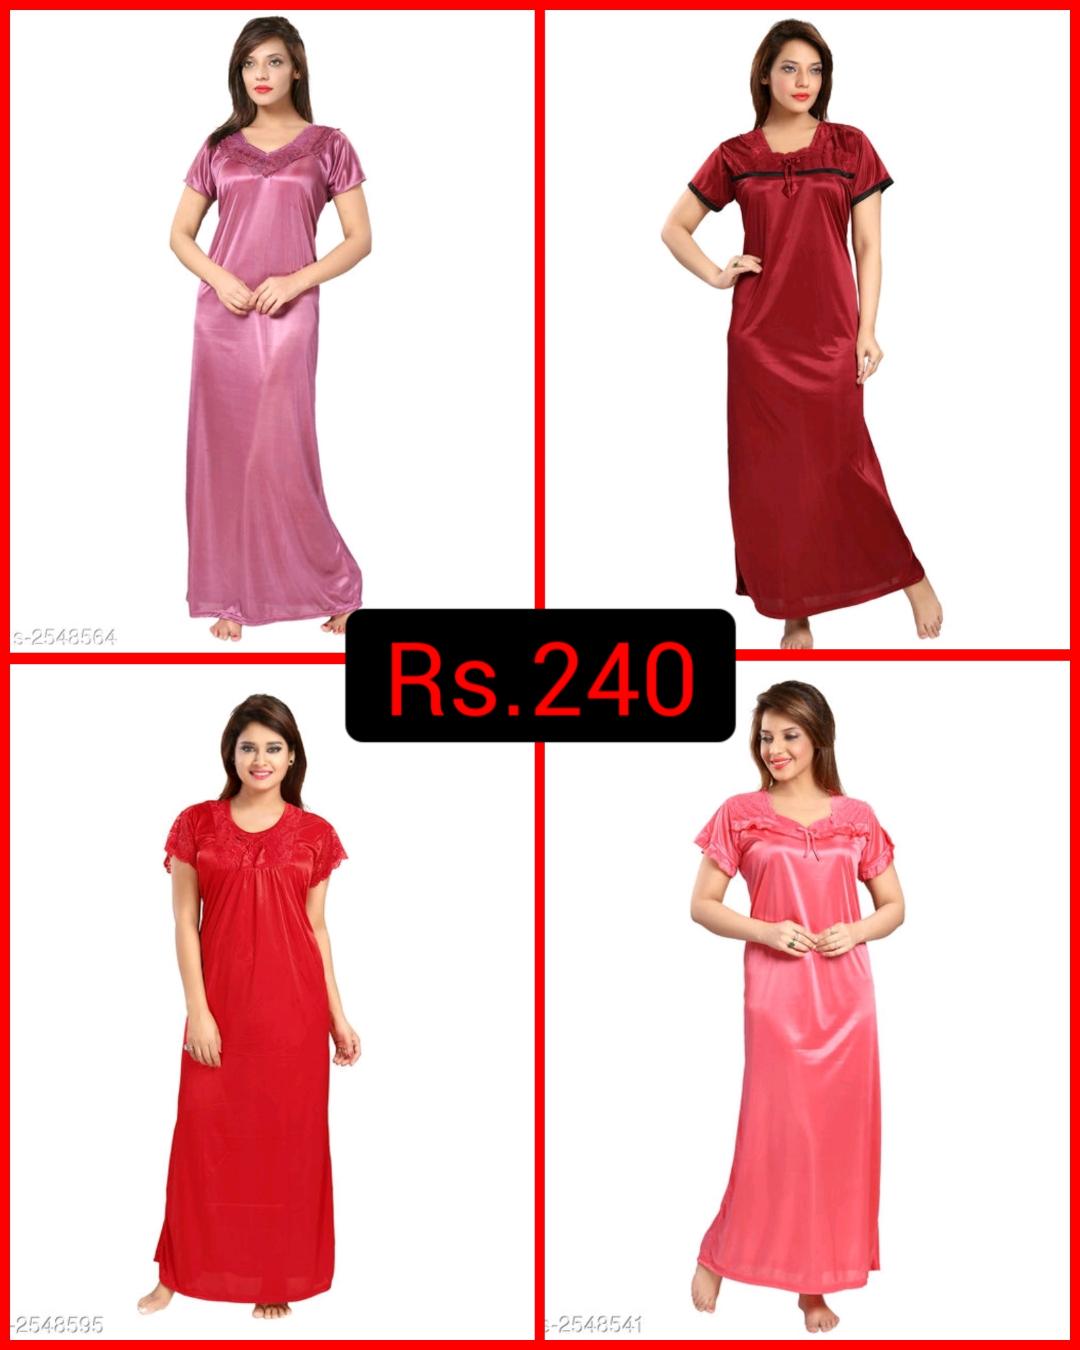 😁 फैशन डिज़ाइनर - S - 2548564 Rs . 240 2548595 - 2548541 - ShareChat